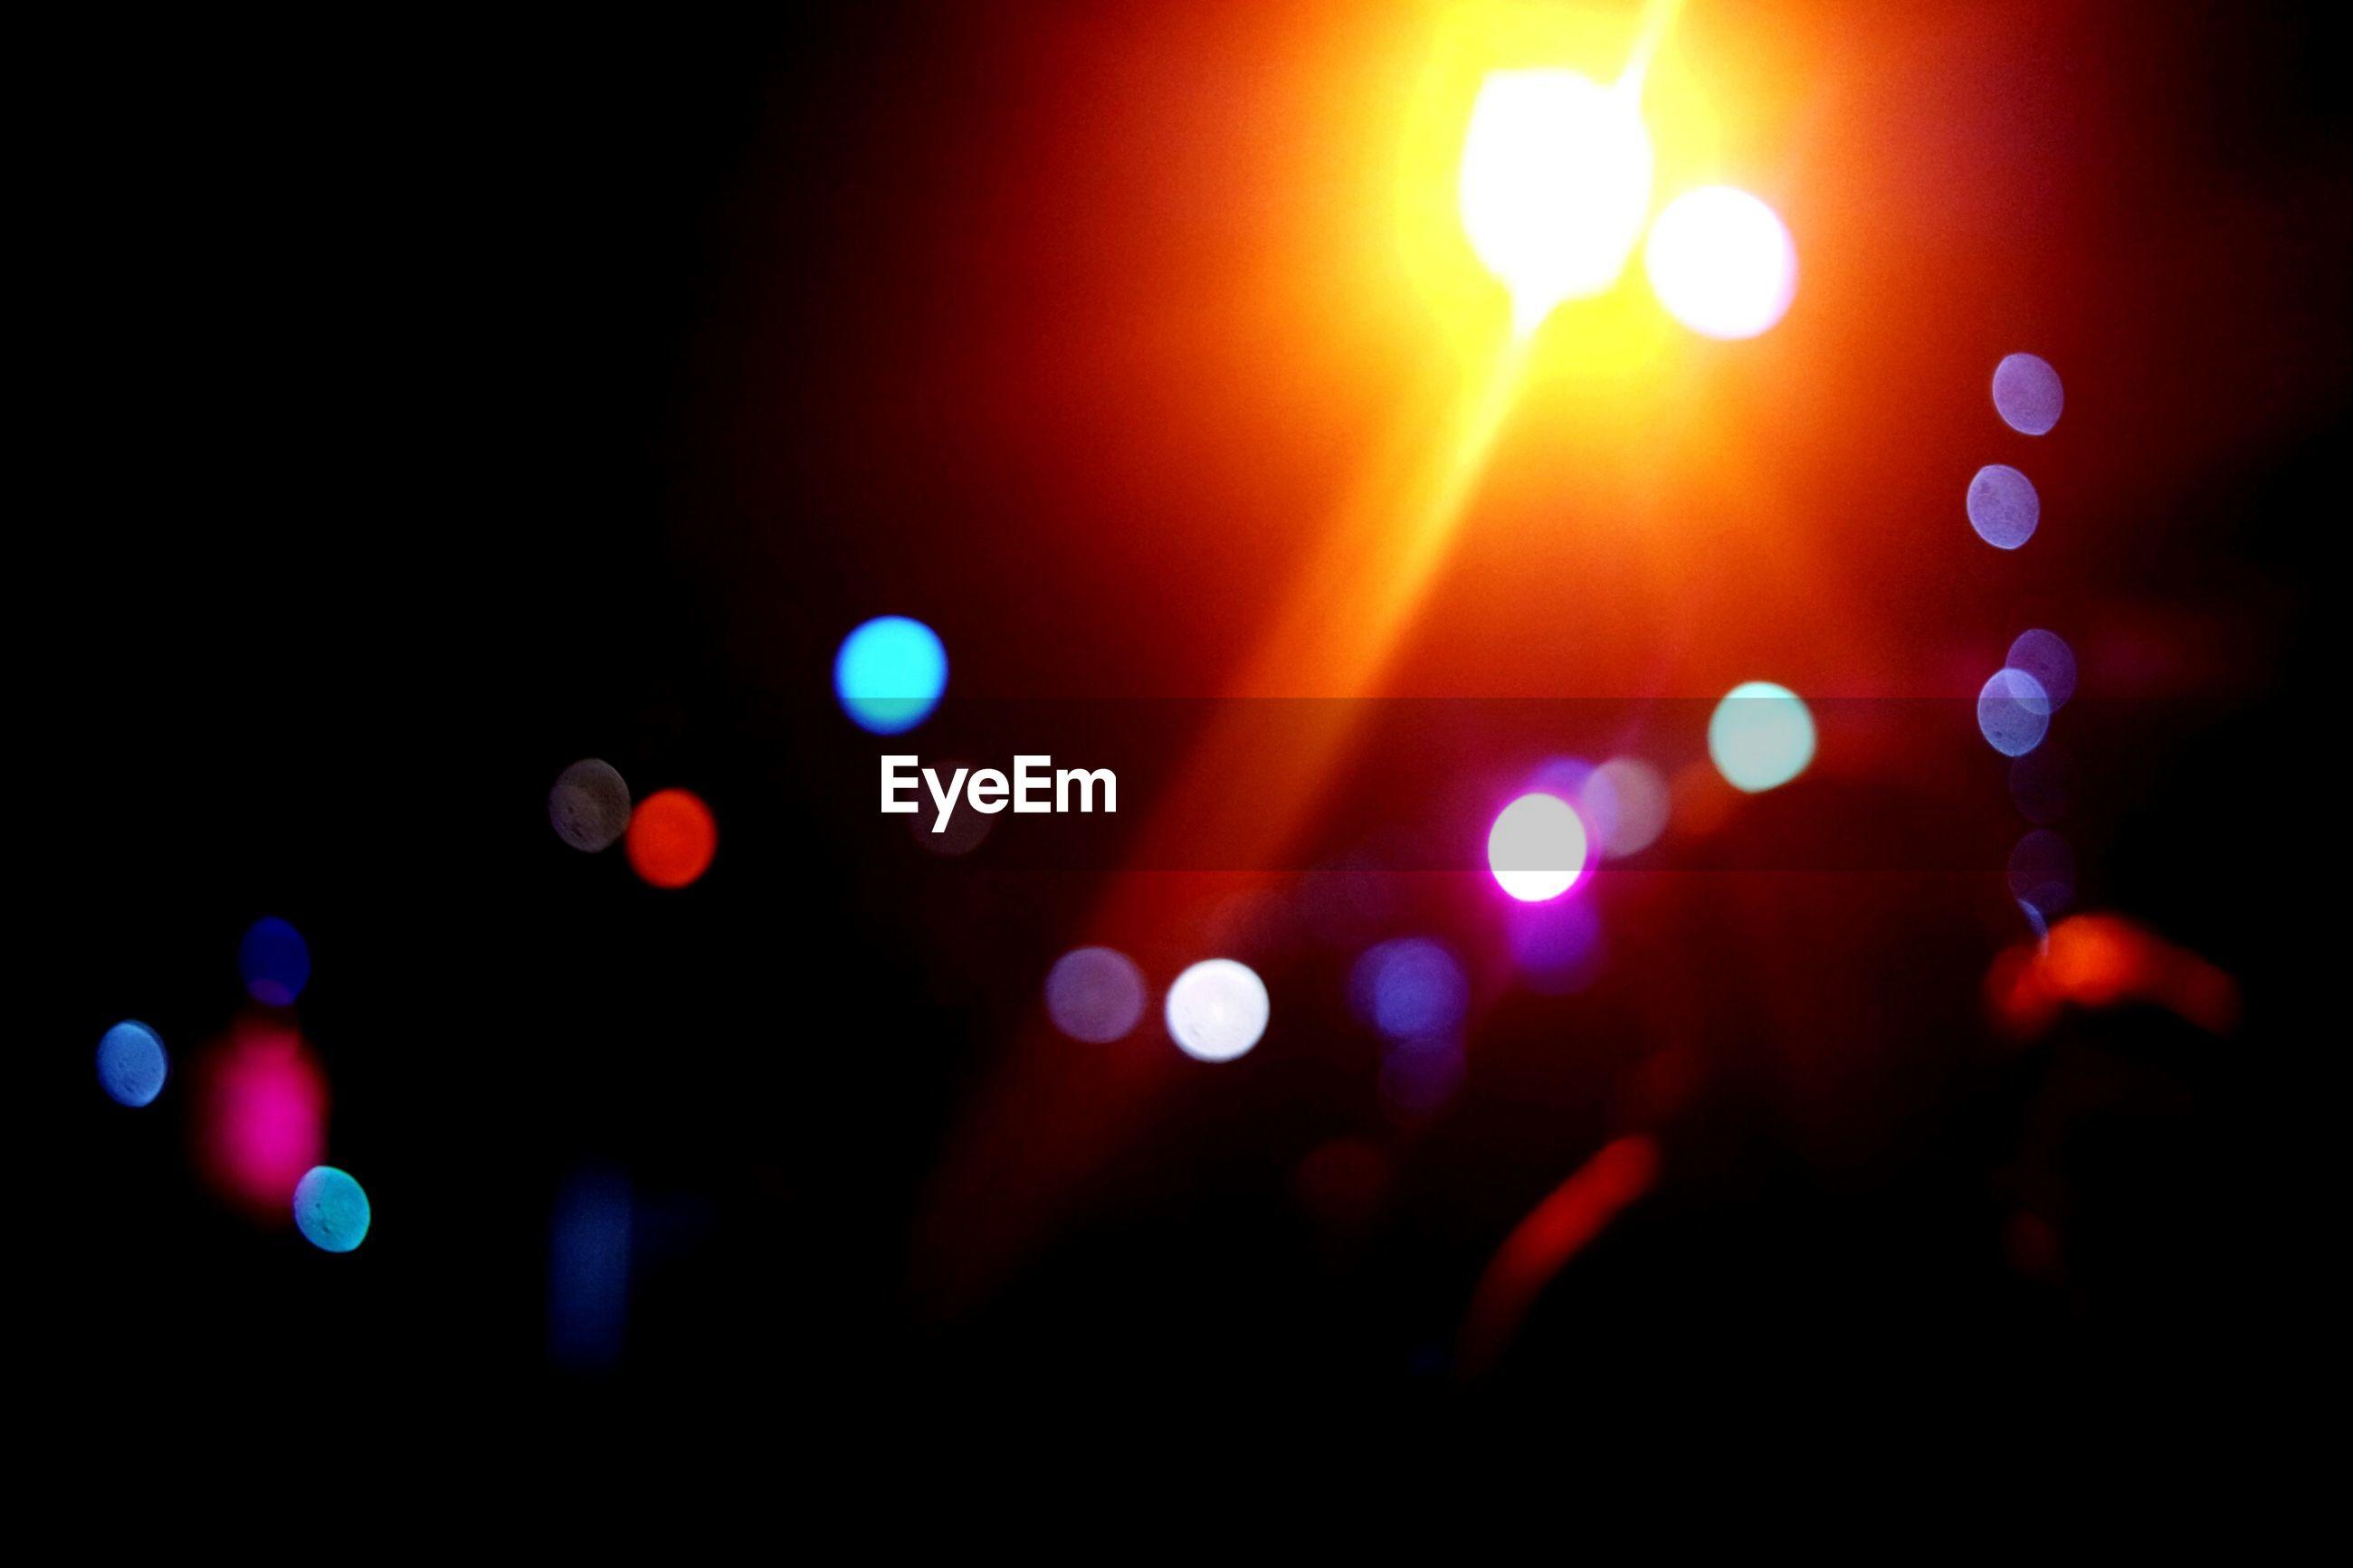 Close-up of illuminated blurred lights at night